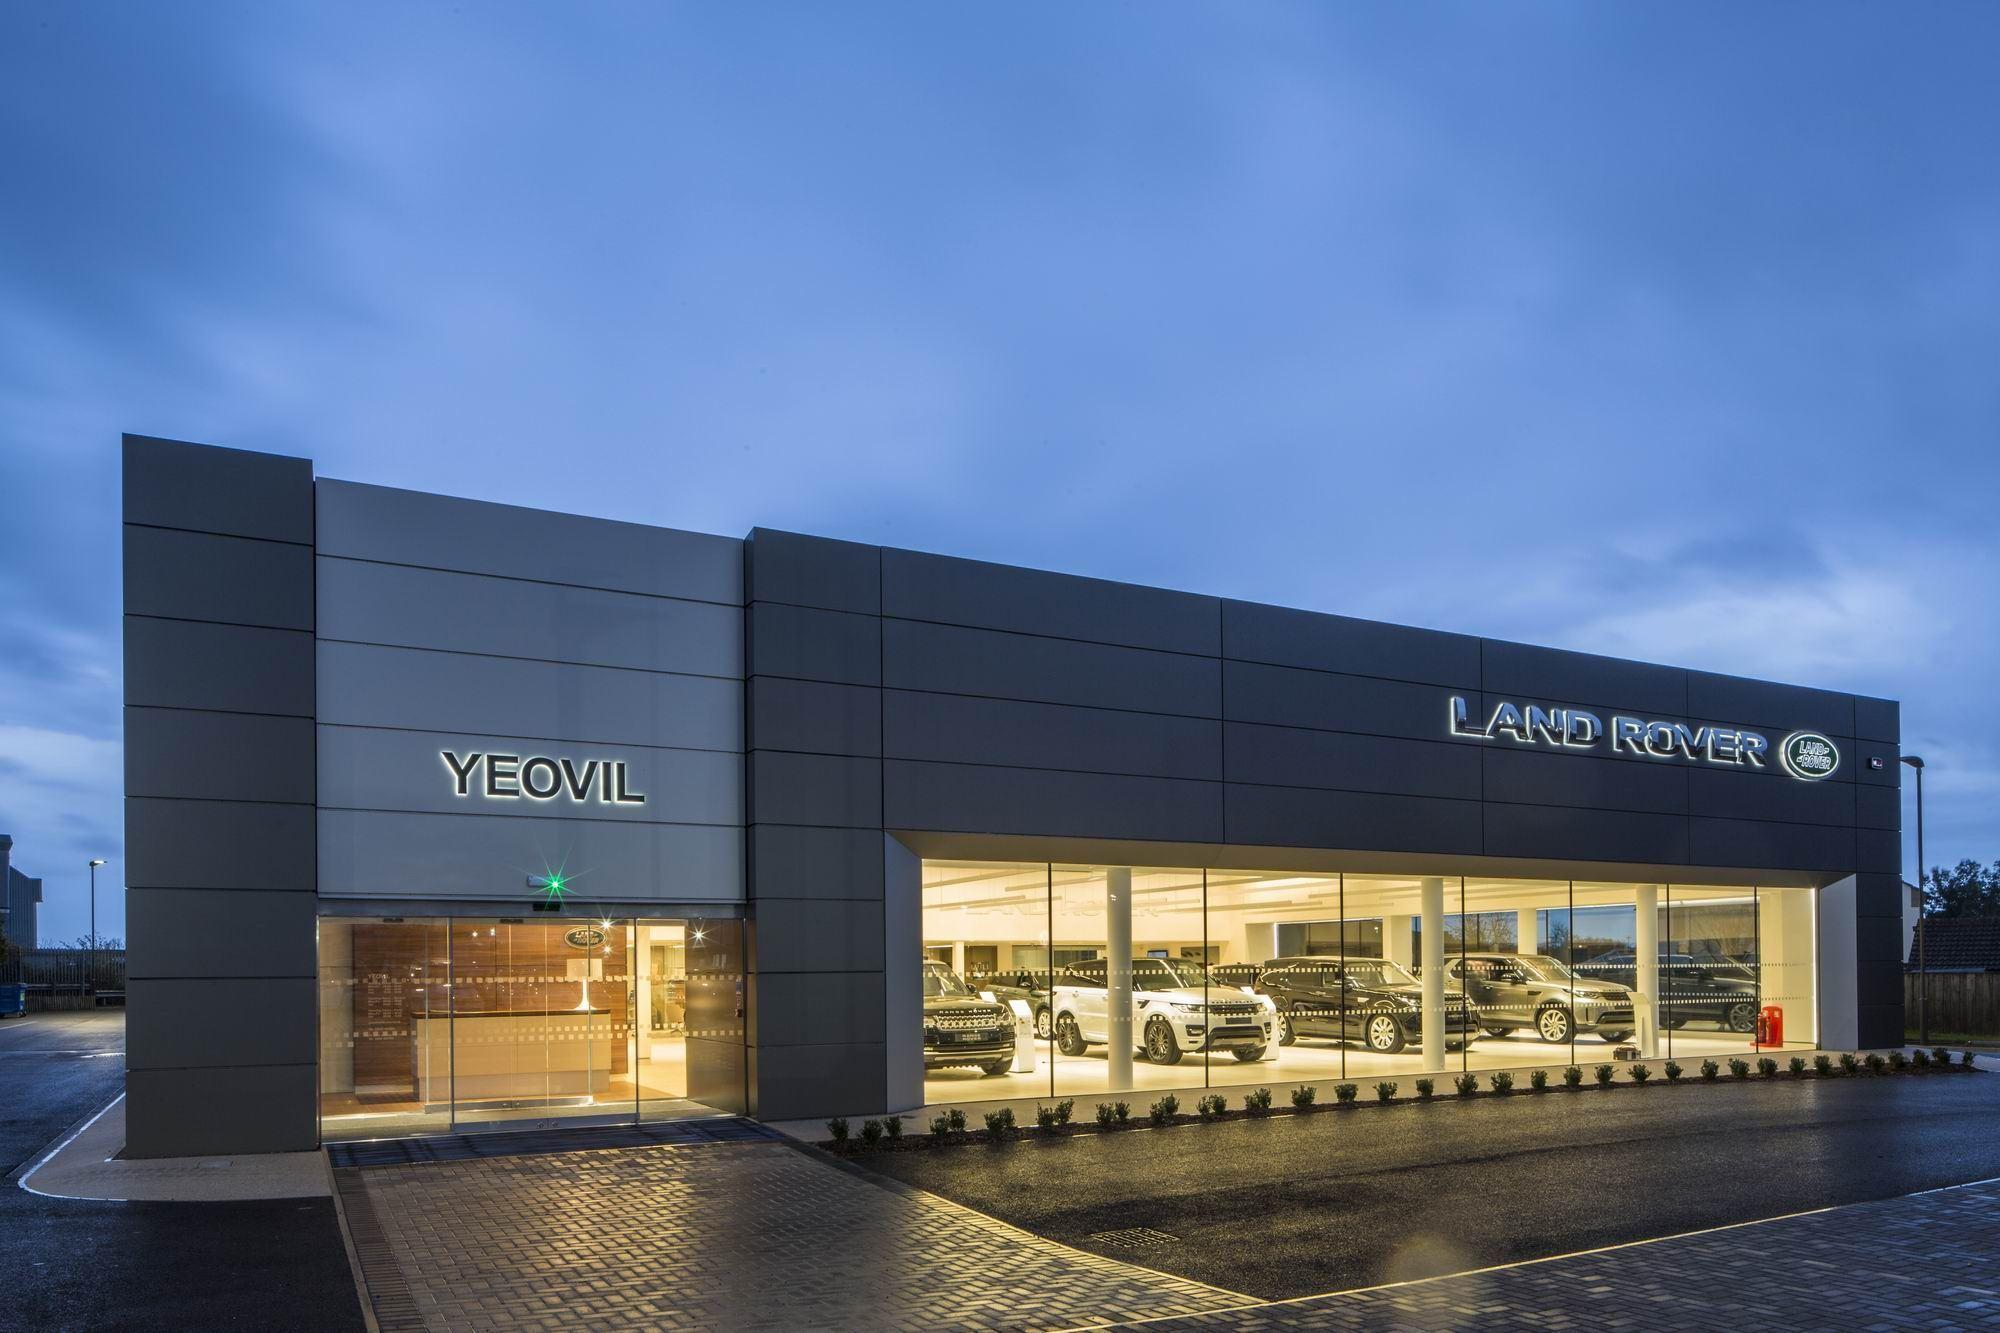 Land Rover, Yeovil, Somerset